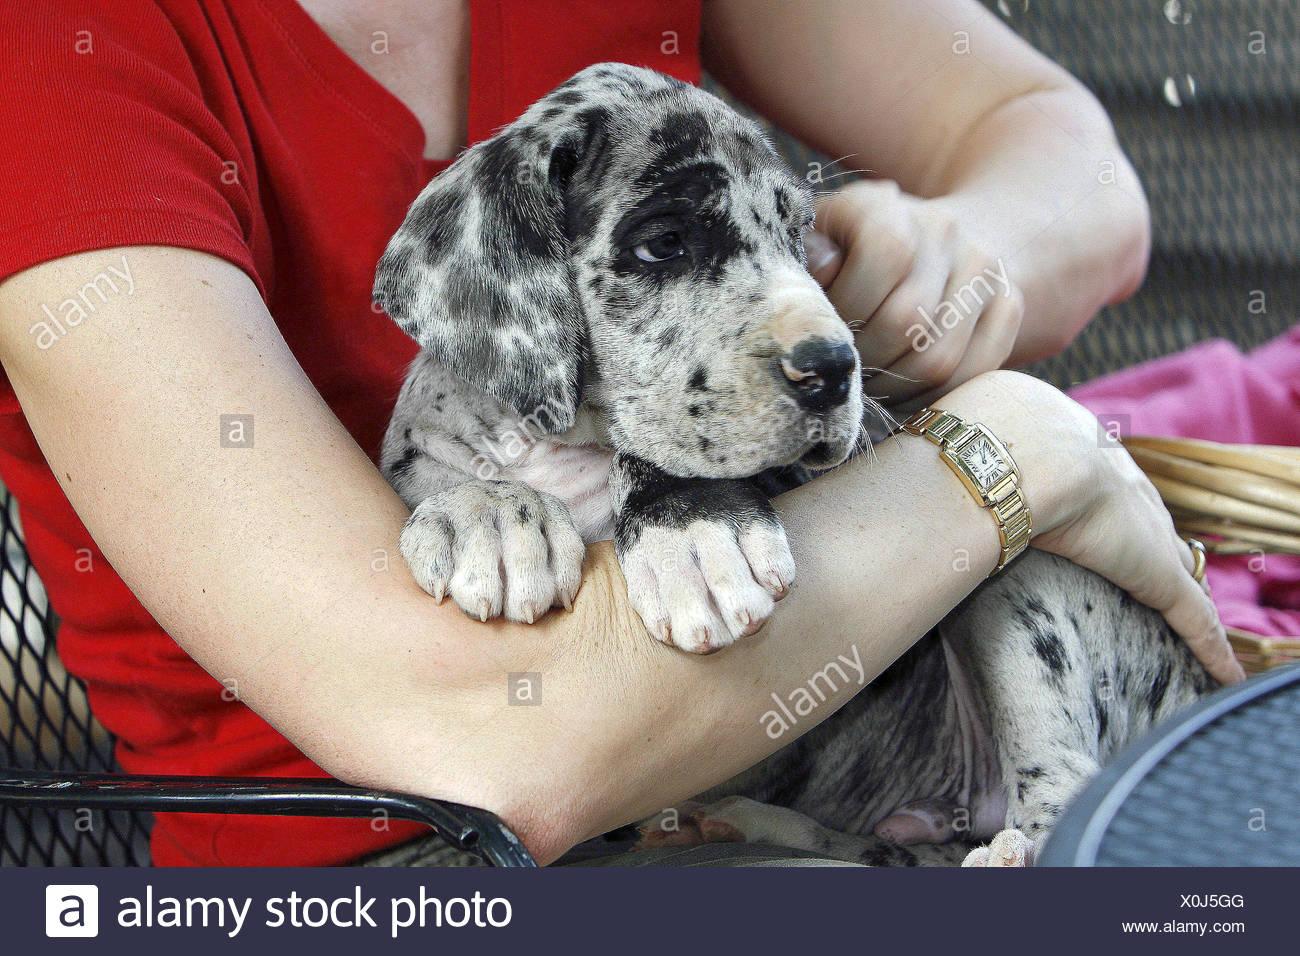 Frau intim mit hund